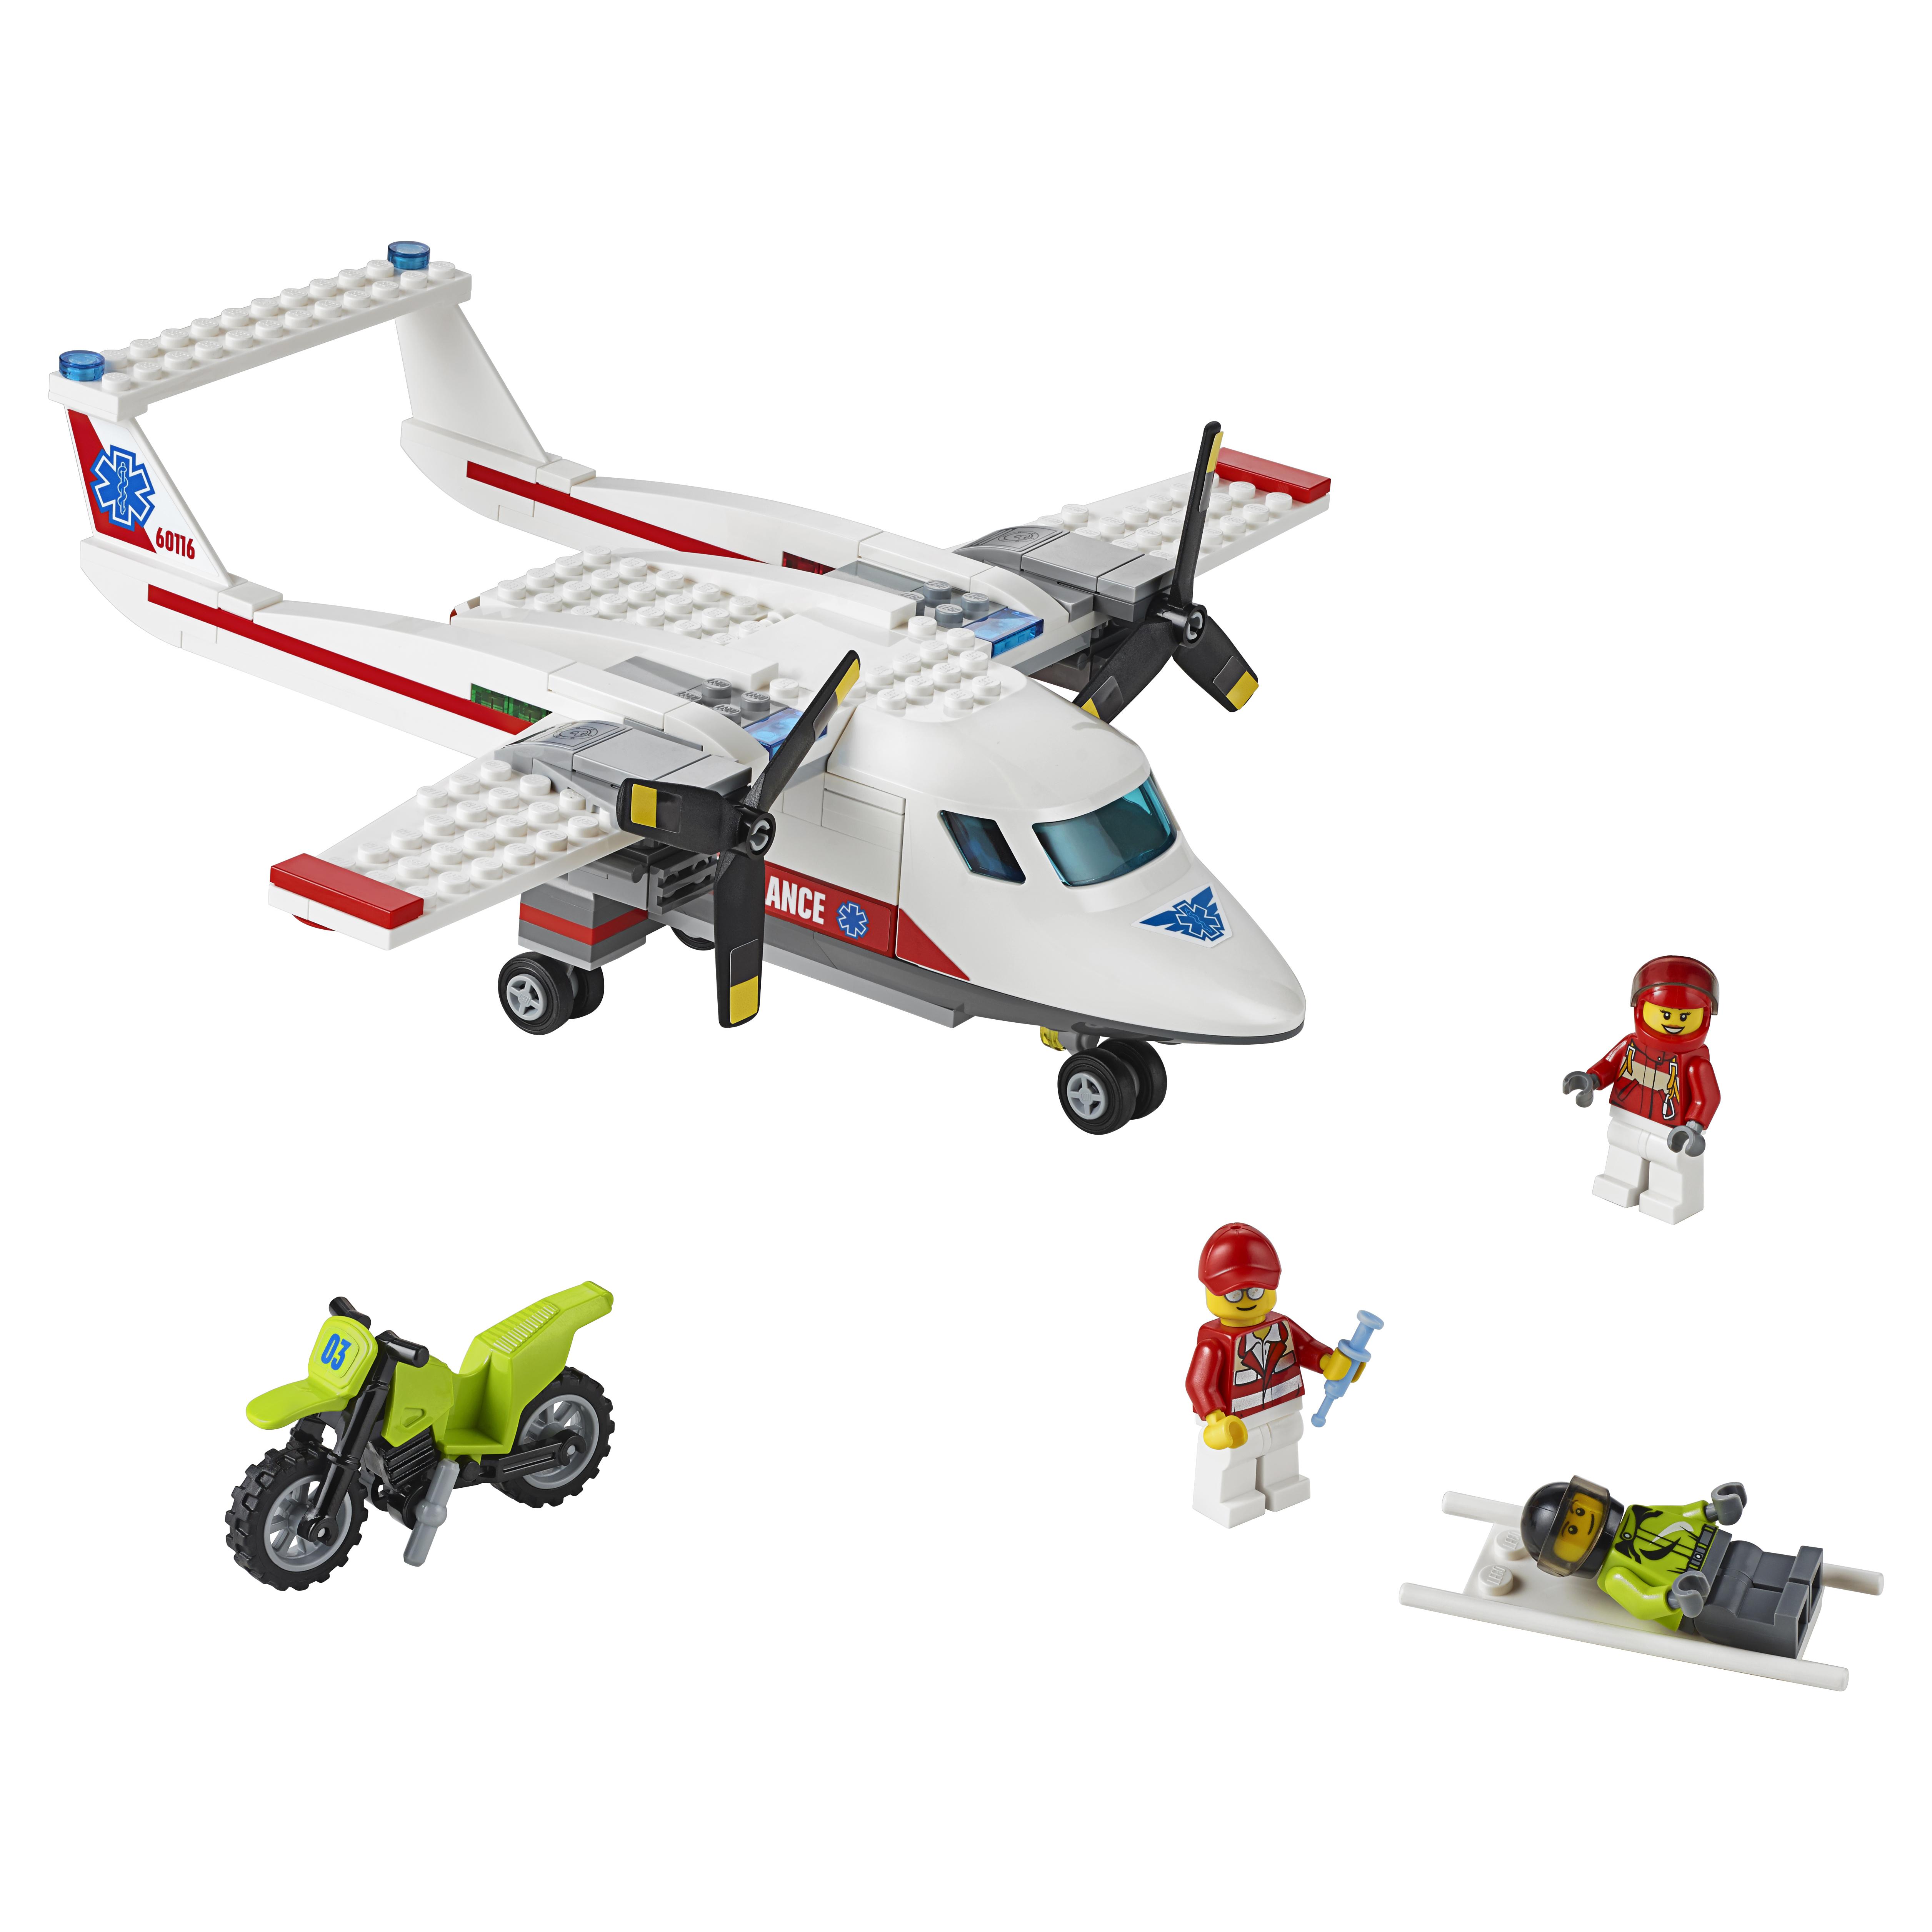 Конструктор LEGO City Great Vehicles Самолет скорой помощи (60116) фото